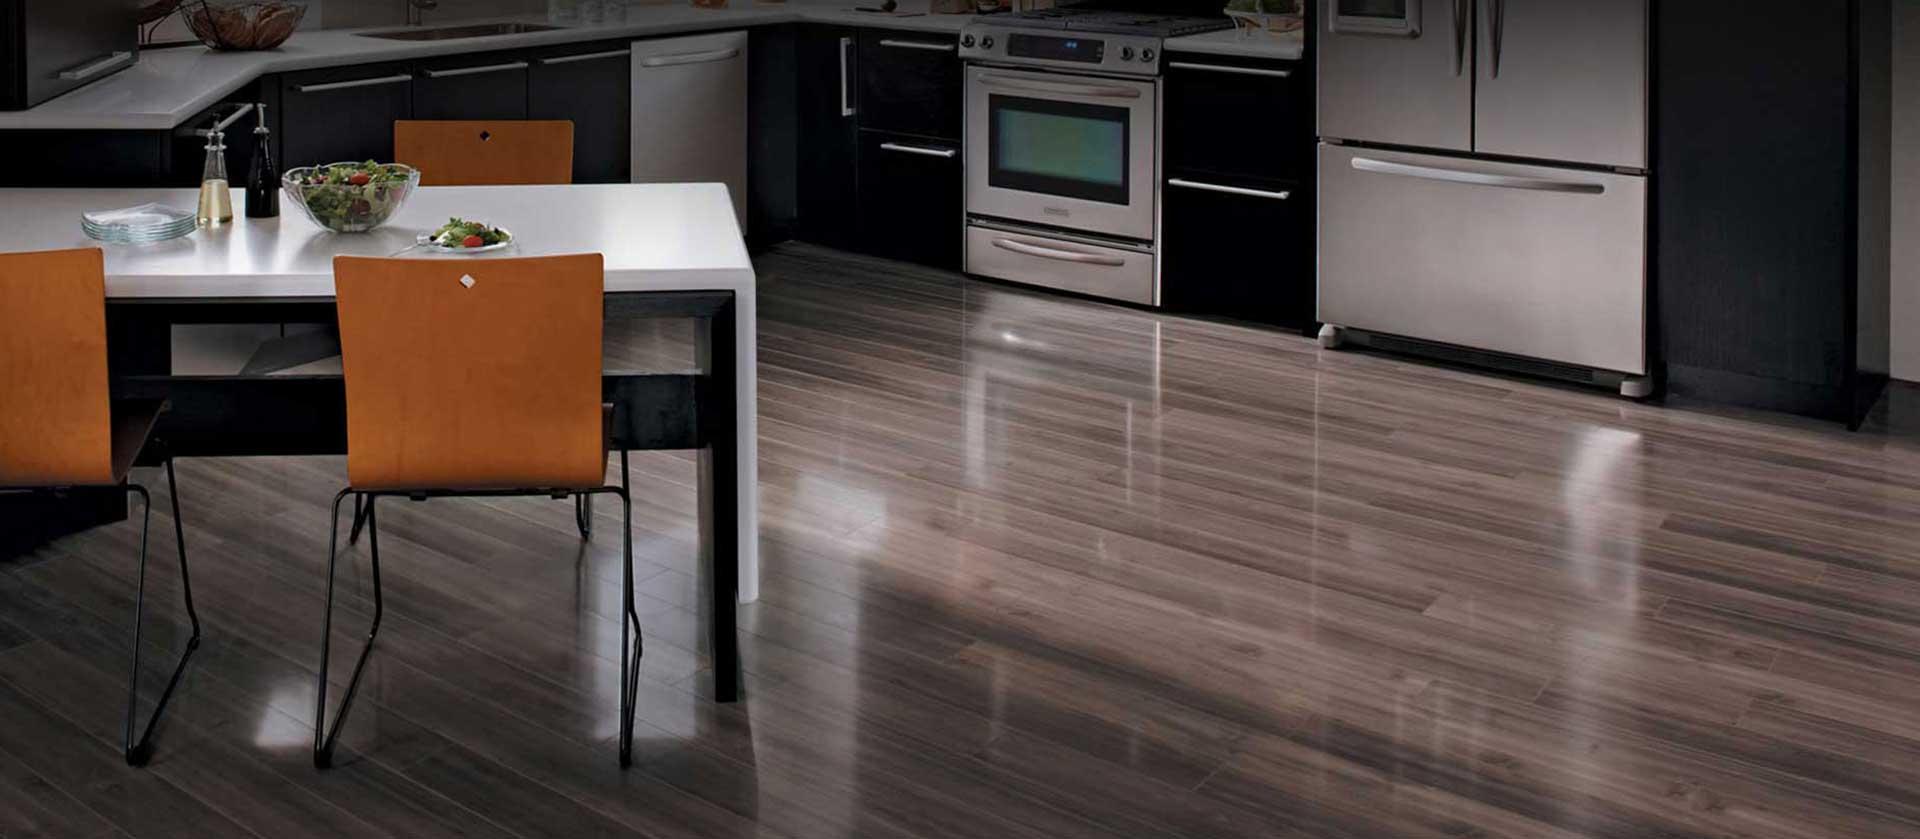 Melbourne Flooring Specialist: Commercial Flooring Melbourne